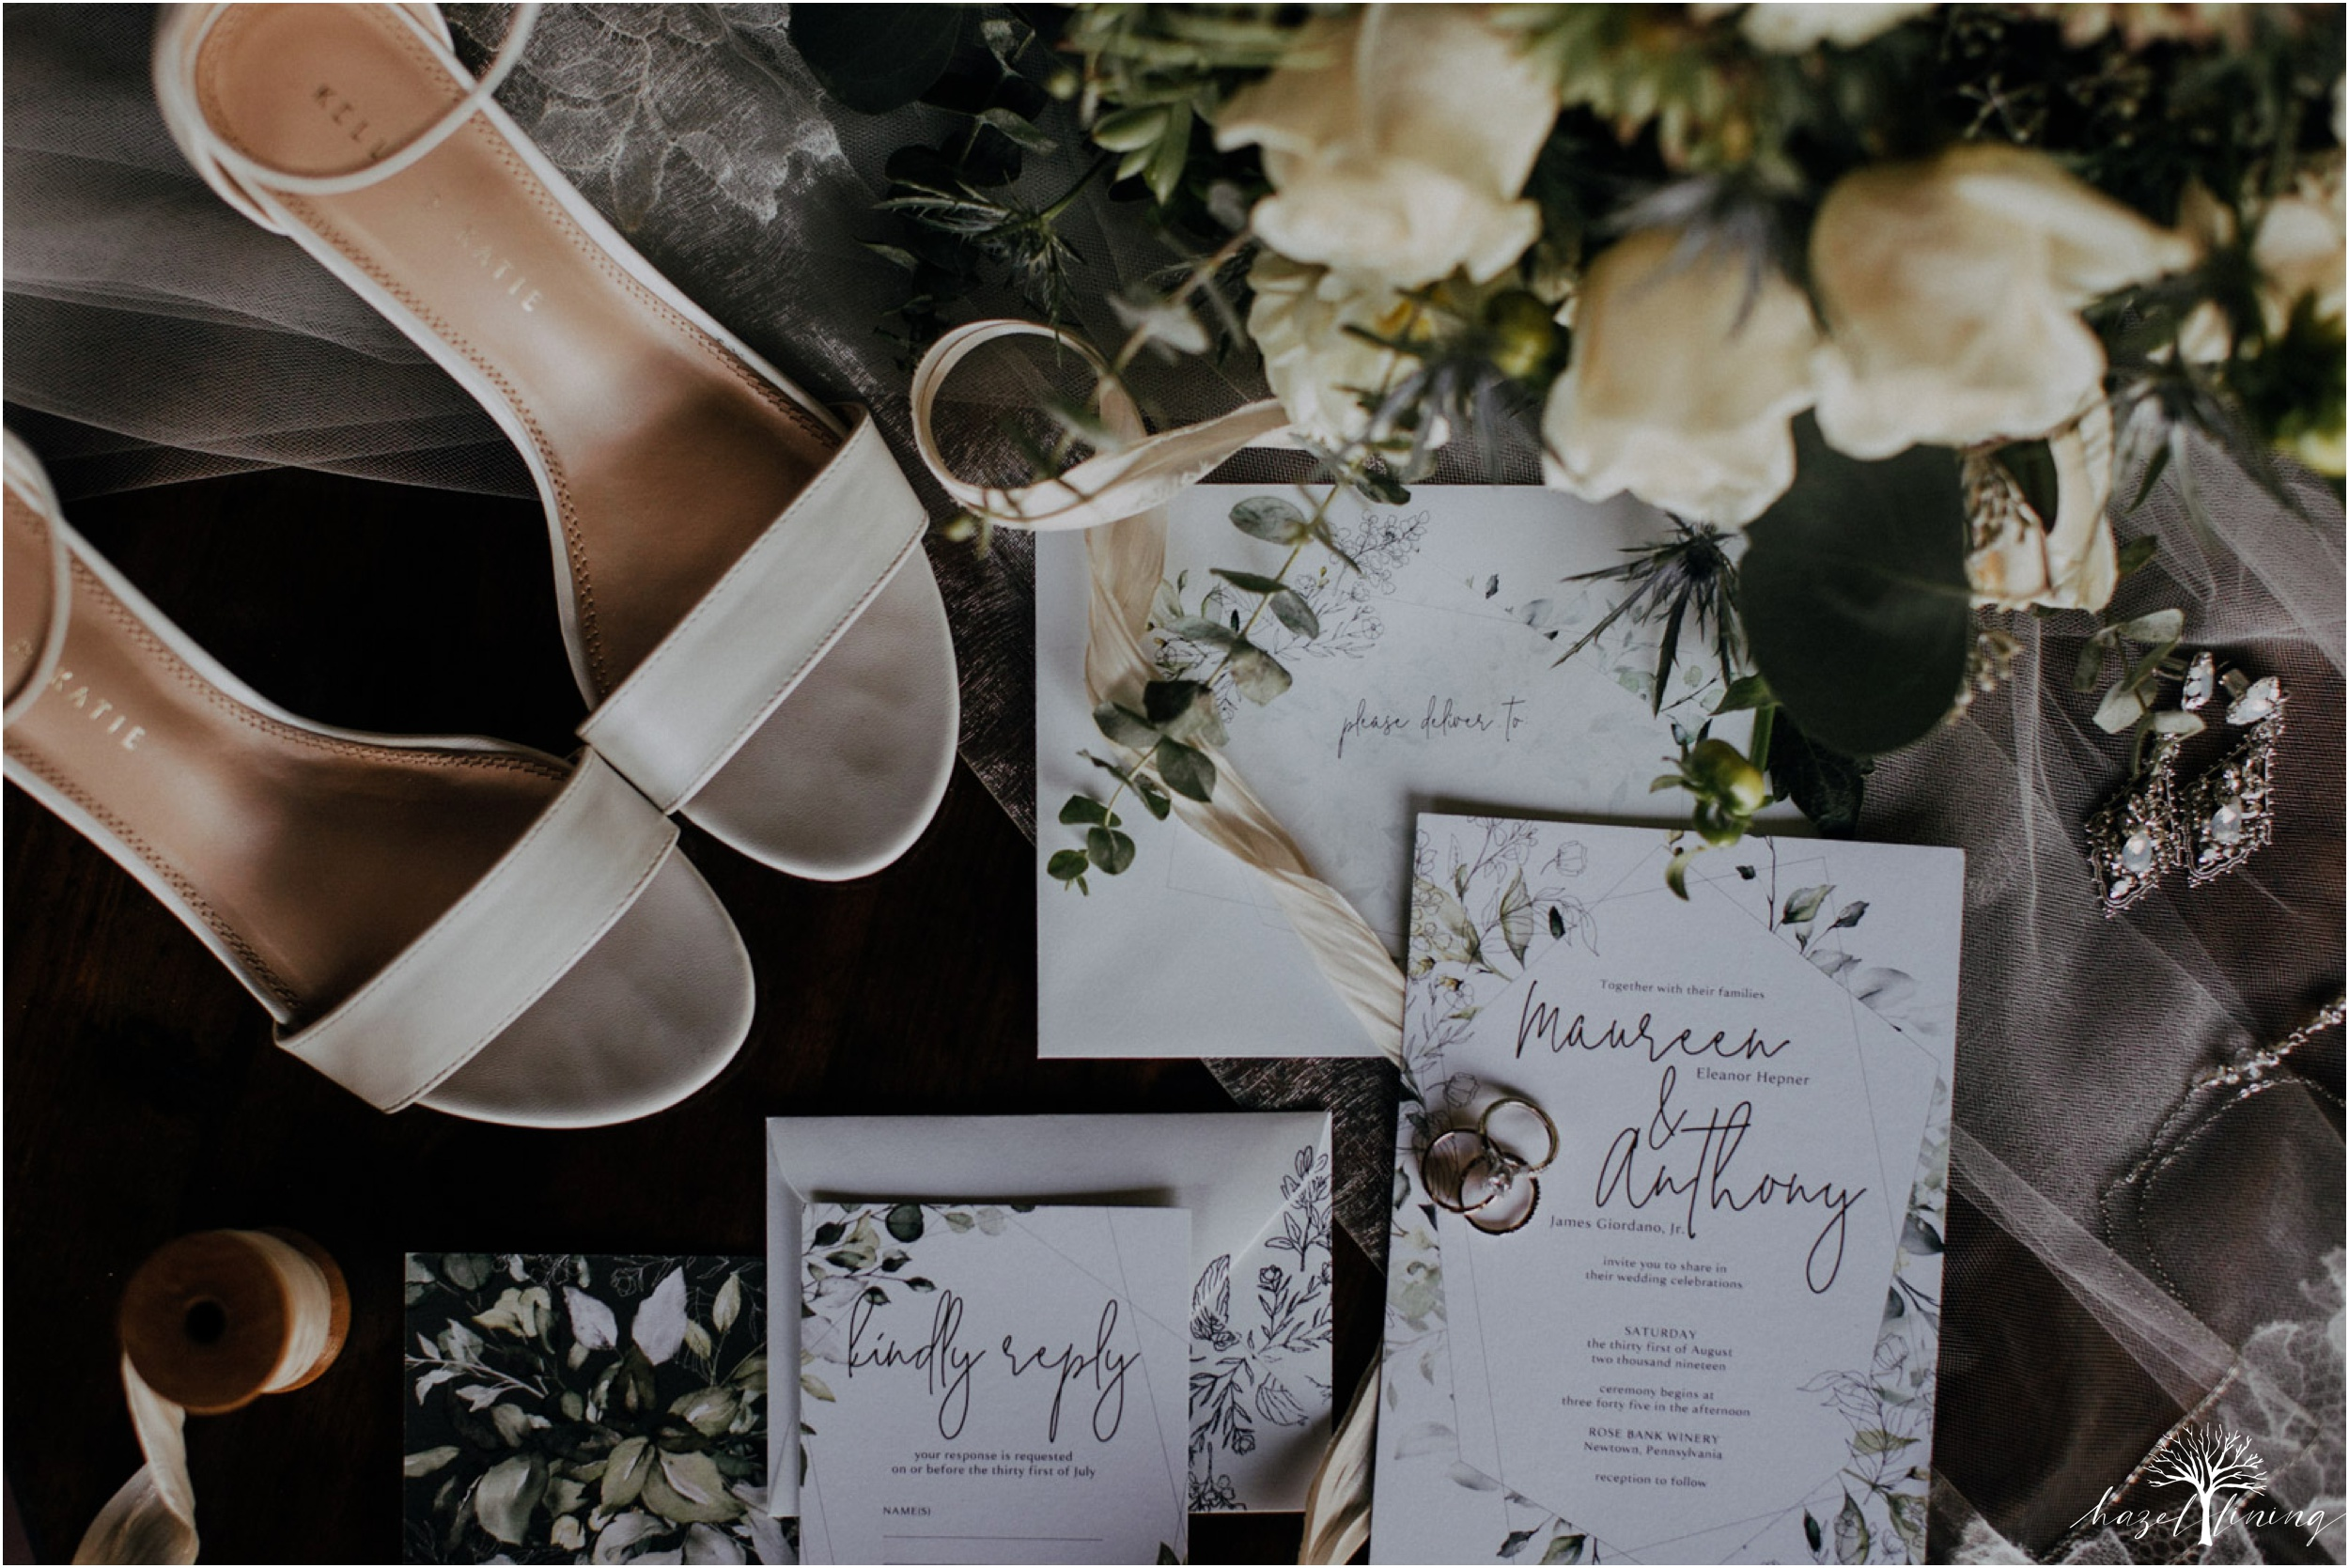 maureen-hepner-anthony-giordano-rose-bank-winery-newtow-pennsylvania-luxury-summer-wedding-hazel-lining-photography-destination-elopement-wedding-engagement-photography_0007.jpg